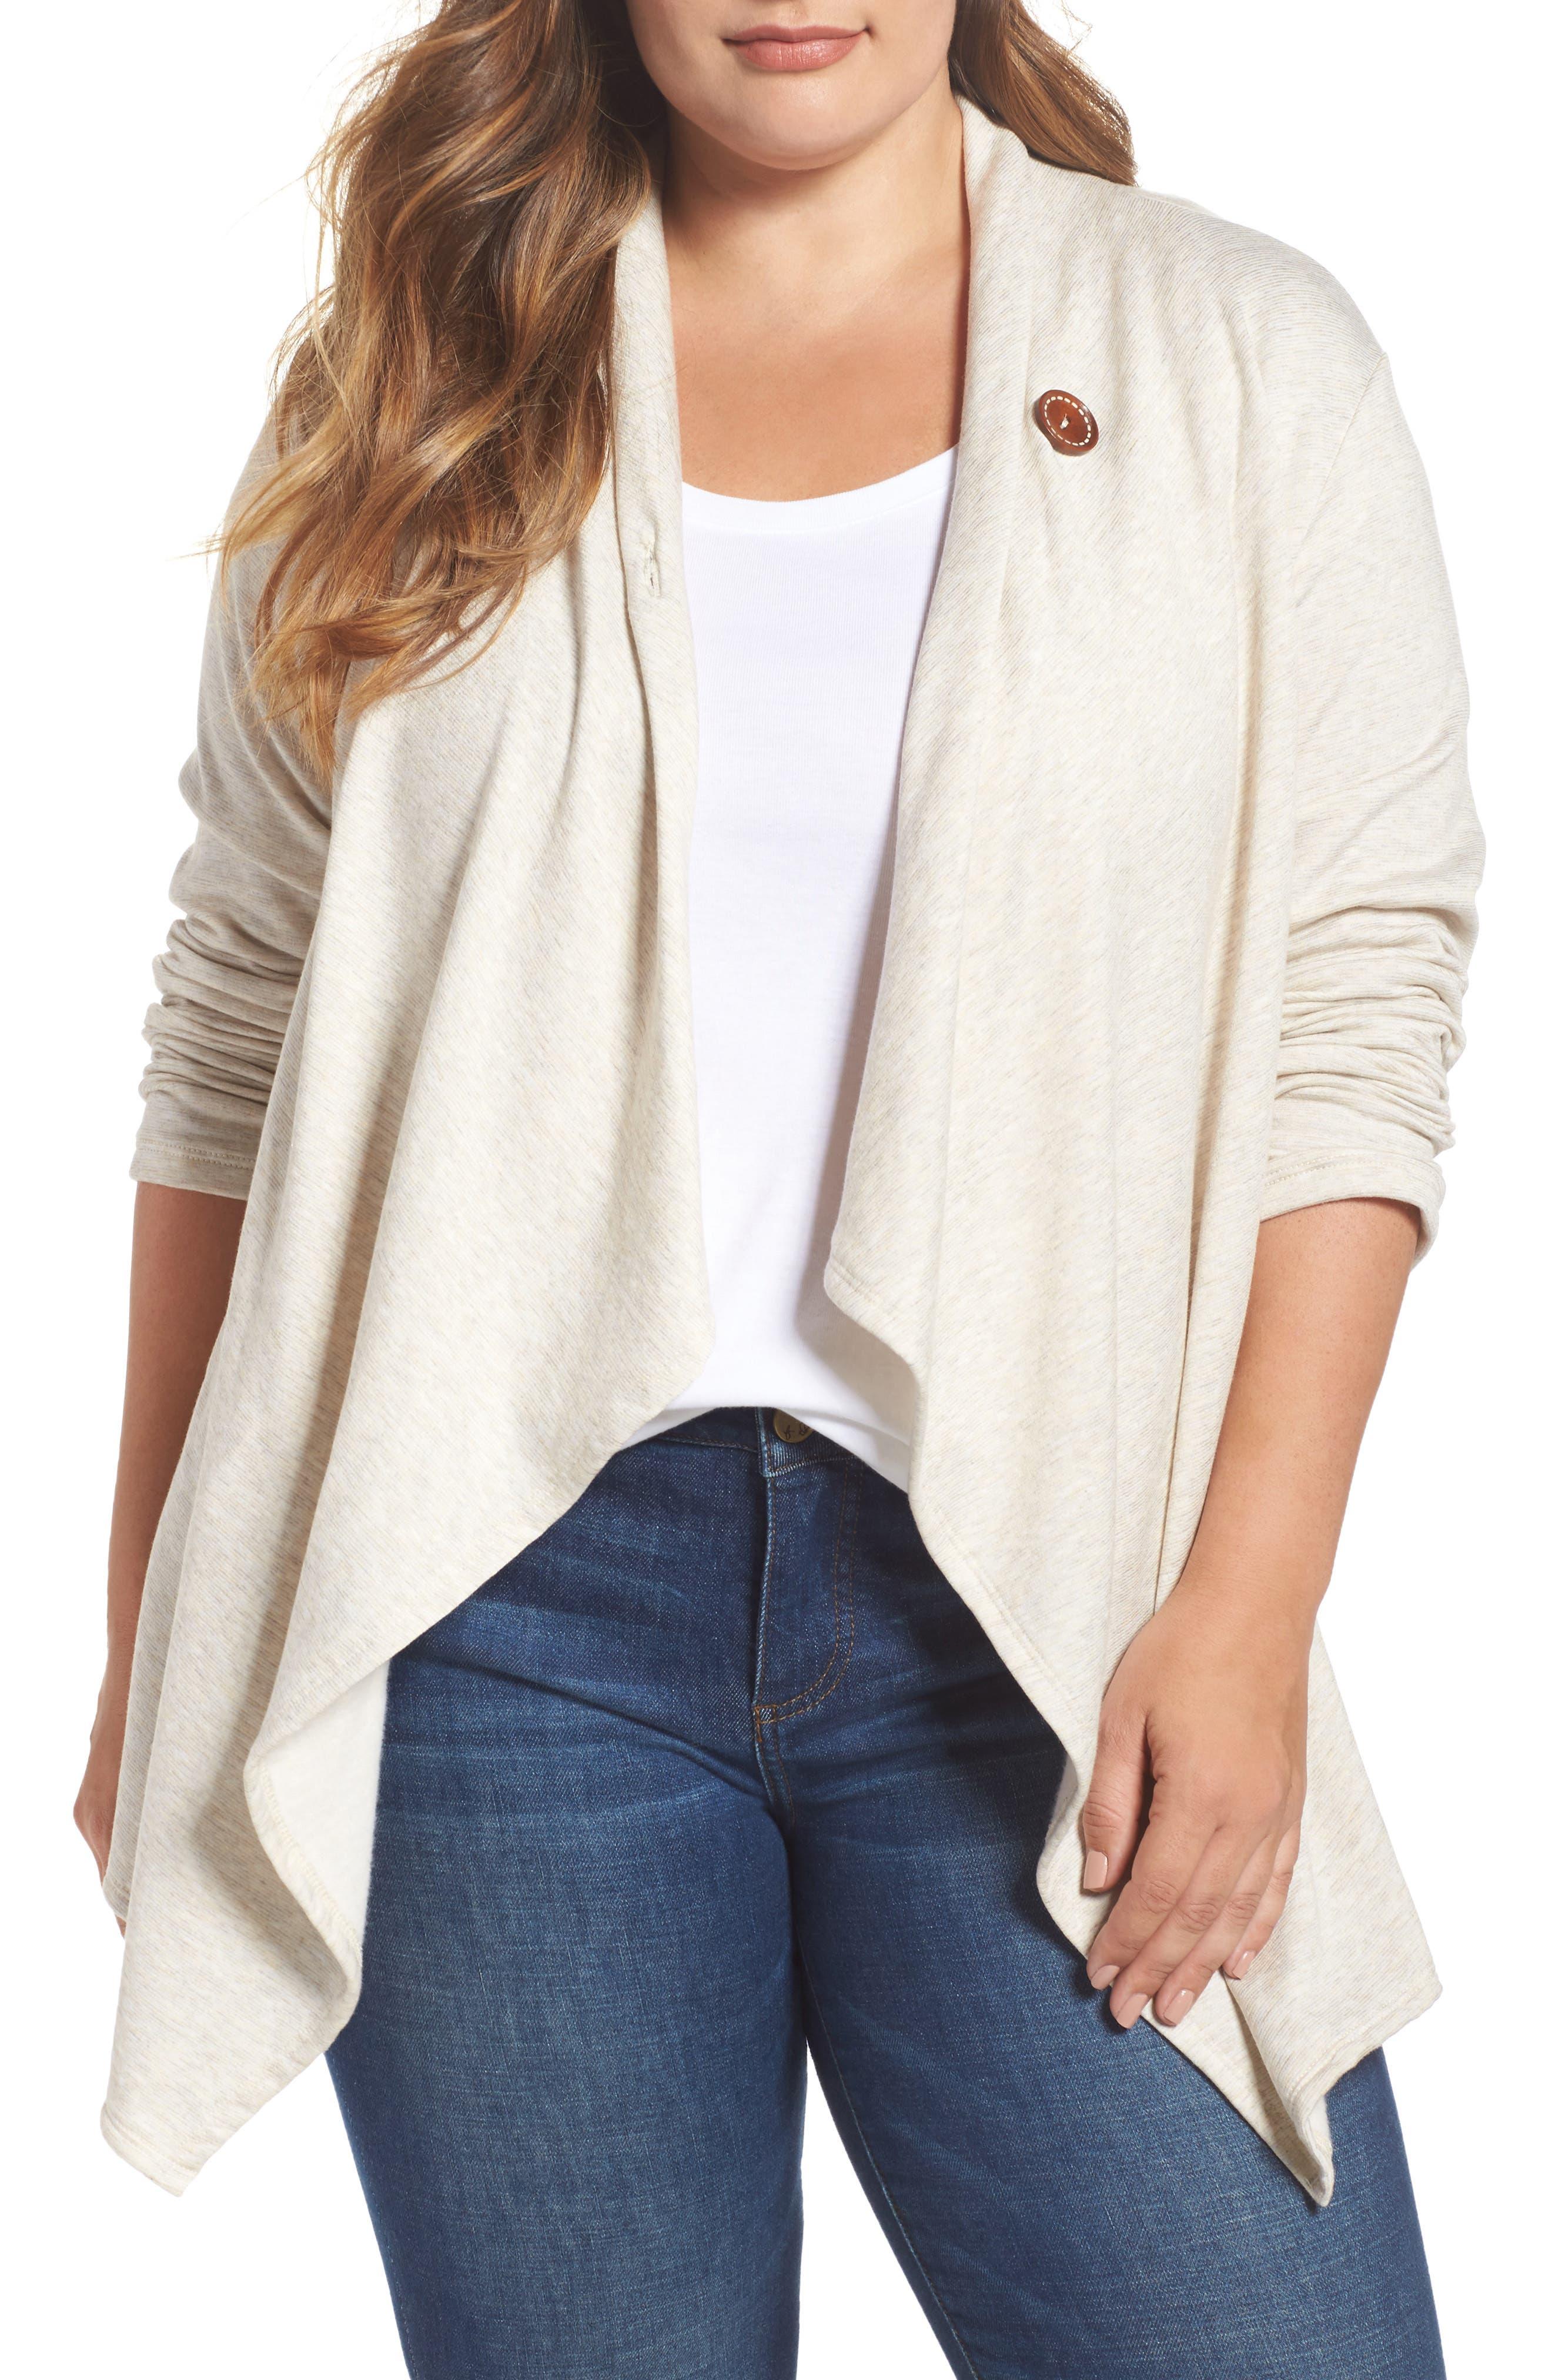 Main Image - Bobeau One-Button Fleece Cardigan (Plus Size)